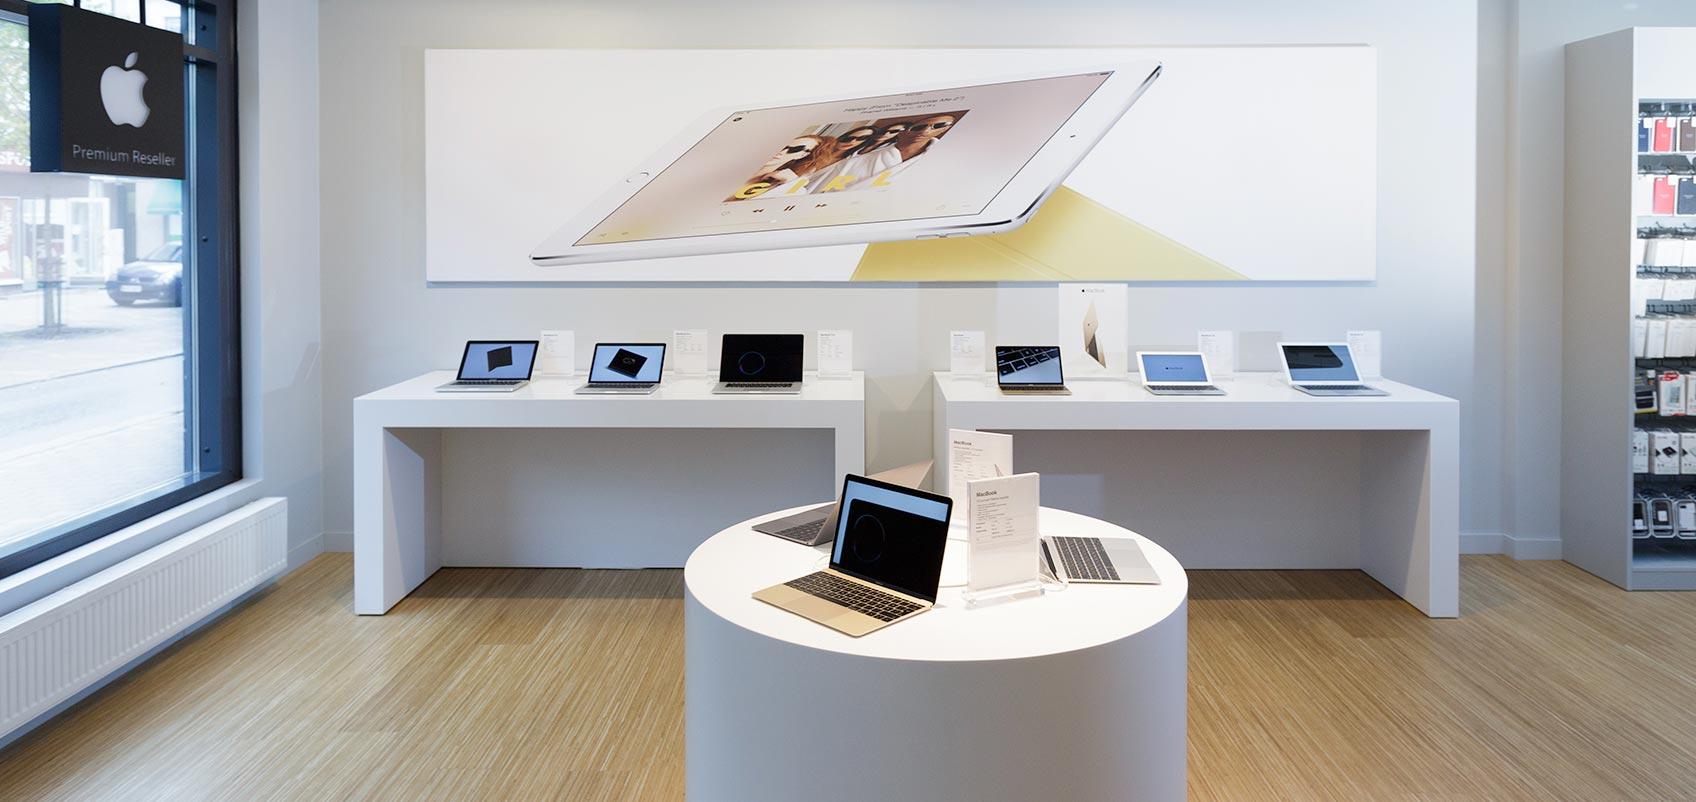 Apple iPad laturi - Tarvikkeet tabletit ja iPad, gigantti